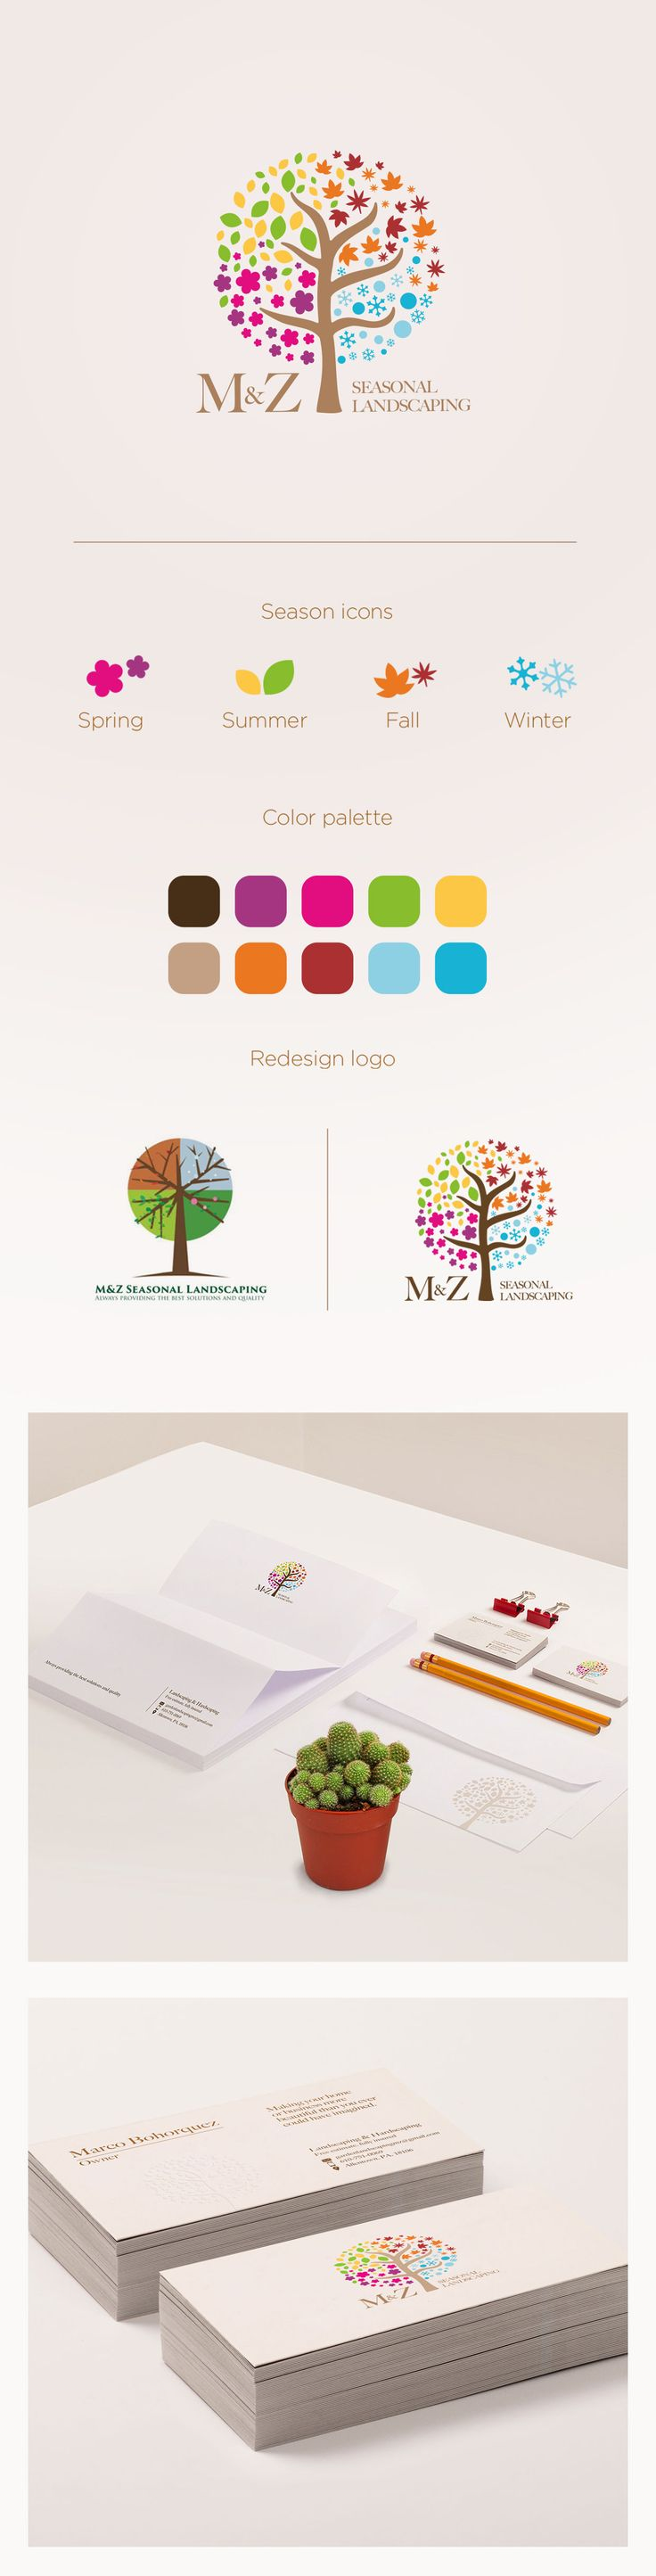 MZ Seasonal Landscaping #rebranding #redesign #logo #brand